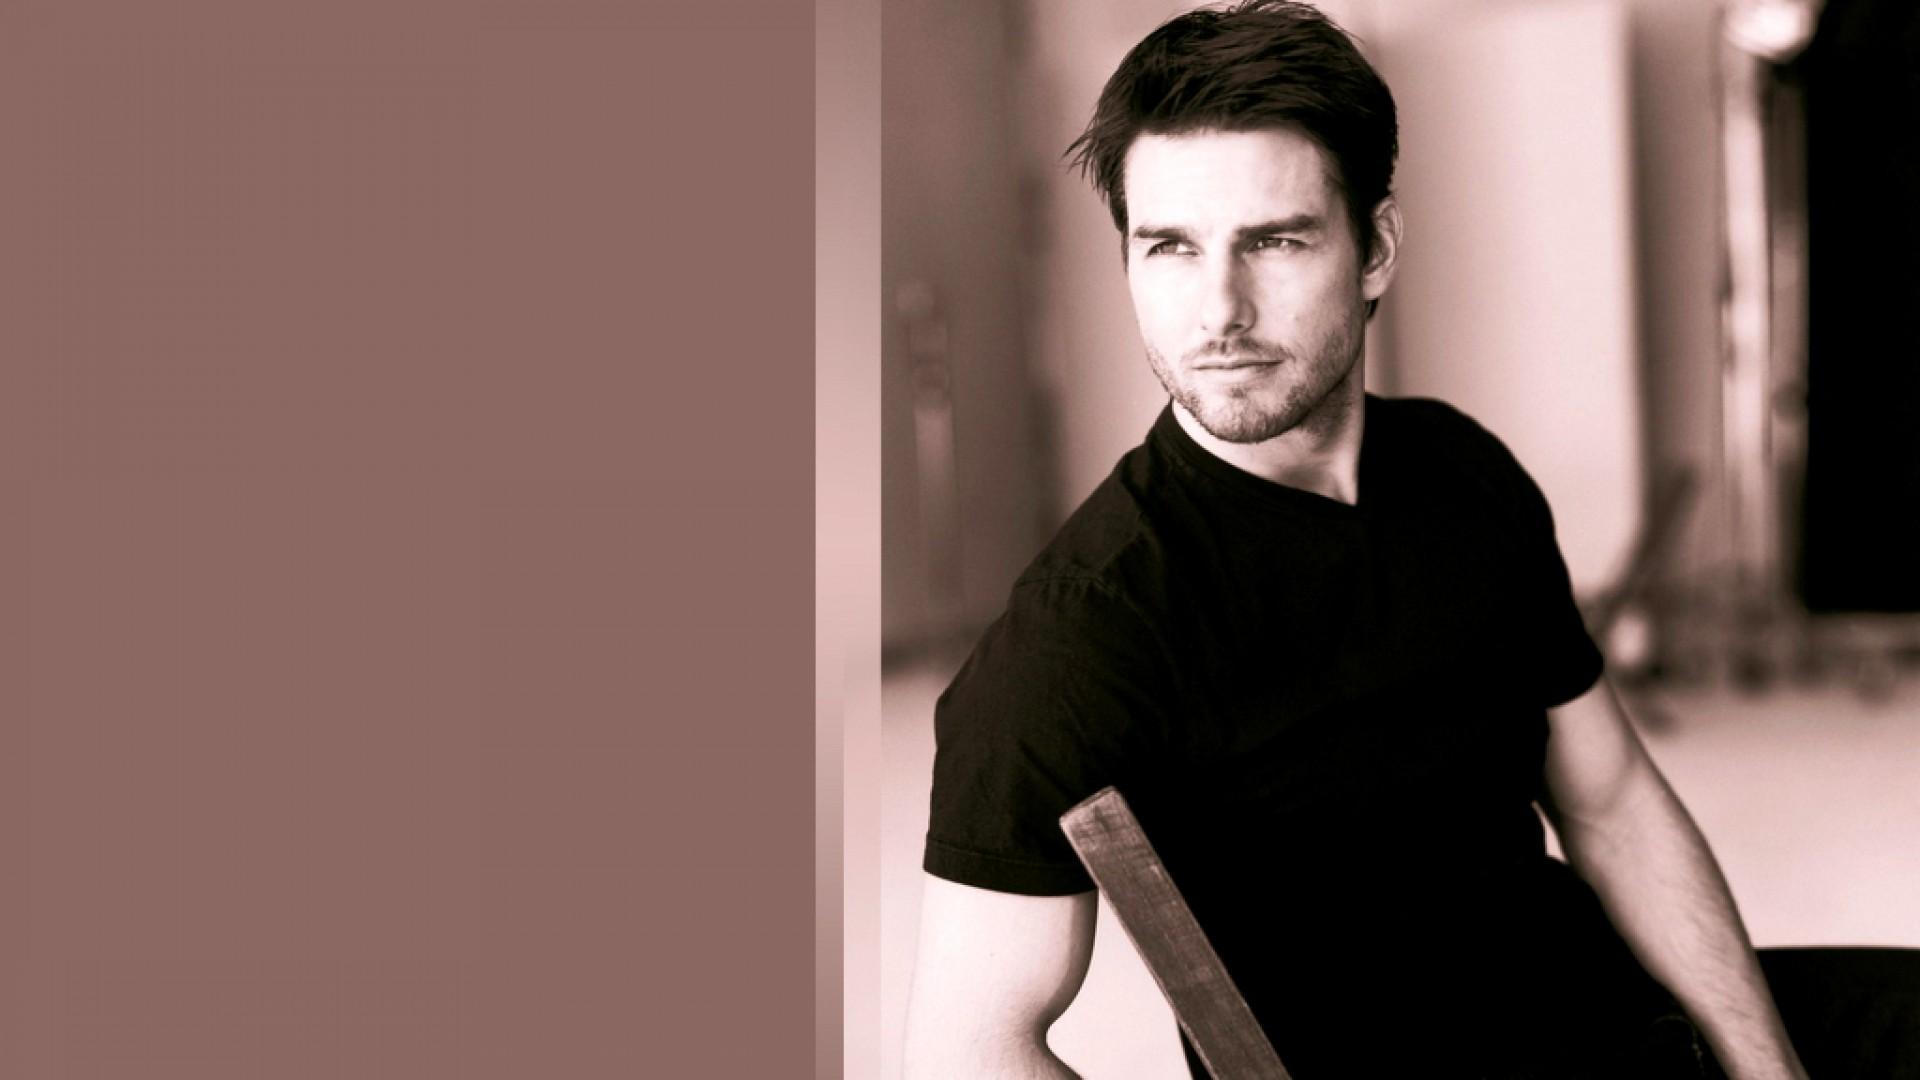 Tom Cruise Wallpaper 6